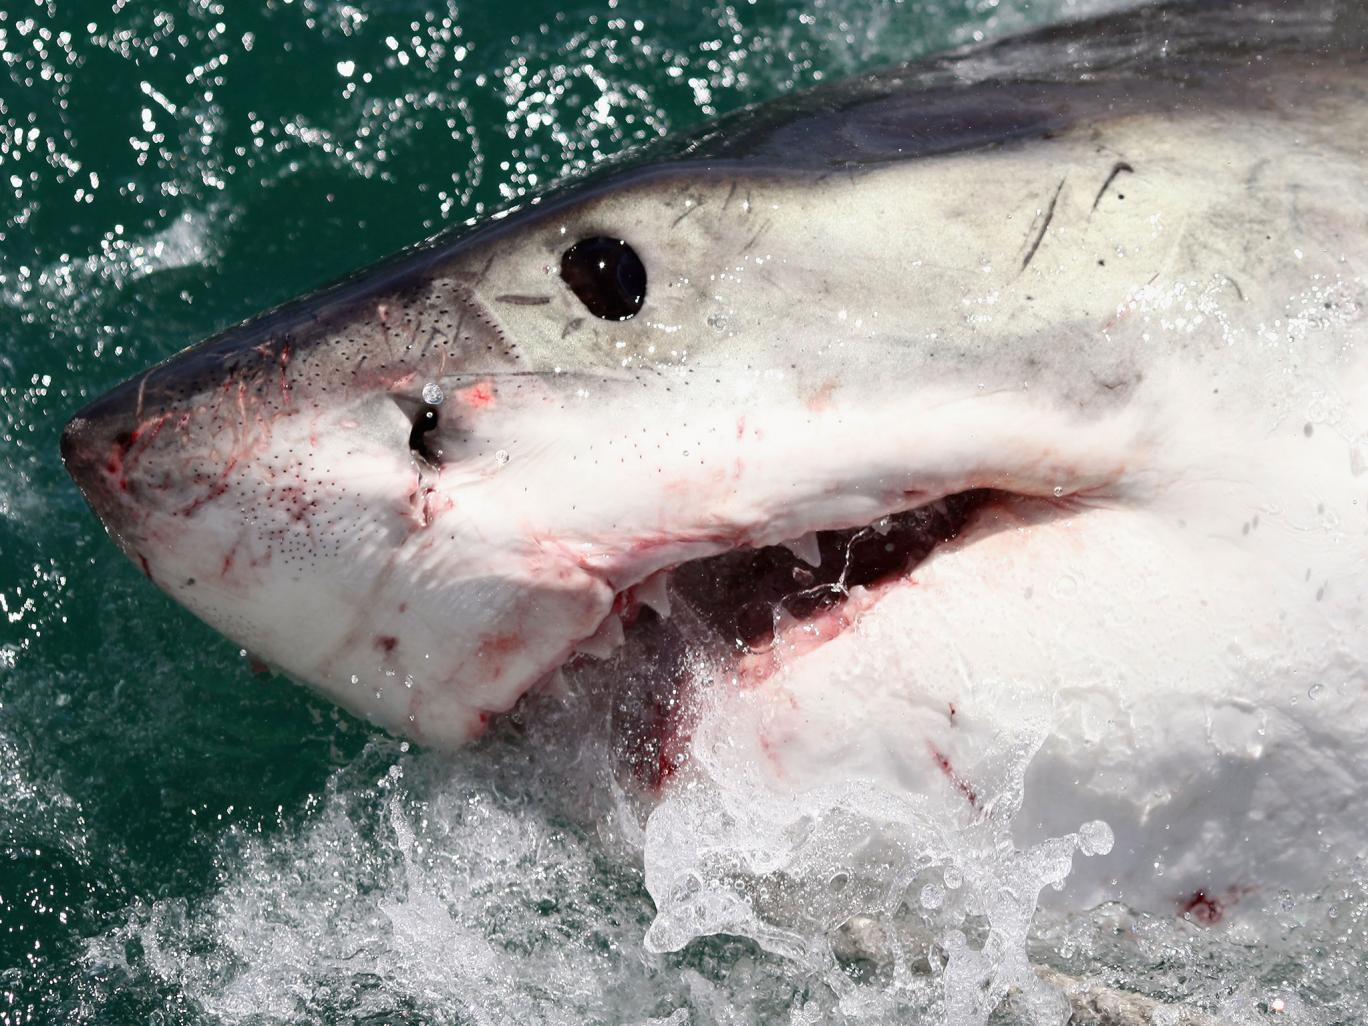 Ghinion teribil pentru un barbat naufragiat in Caraibe. Un rechin l-a atacat chiar in timpul operatiunii de salvare